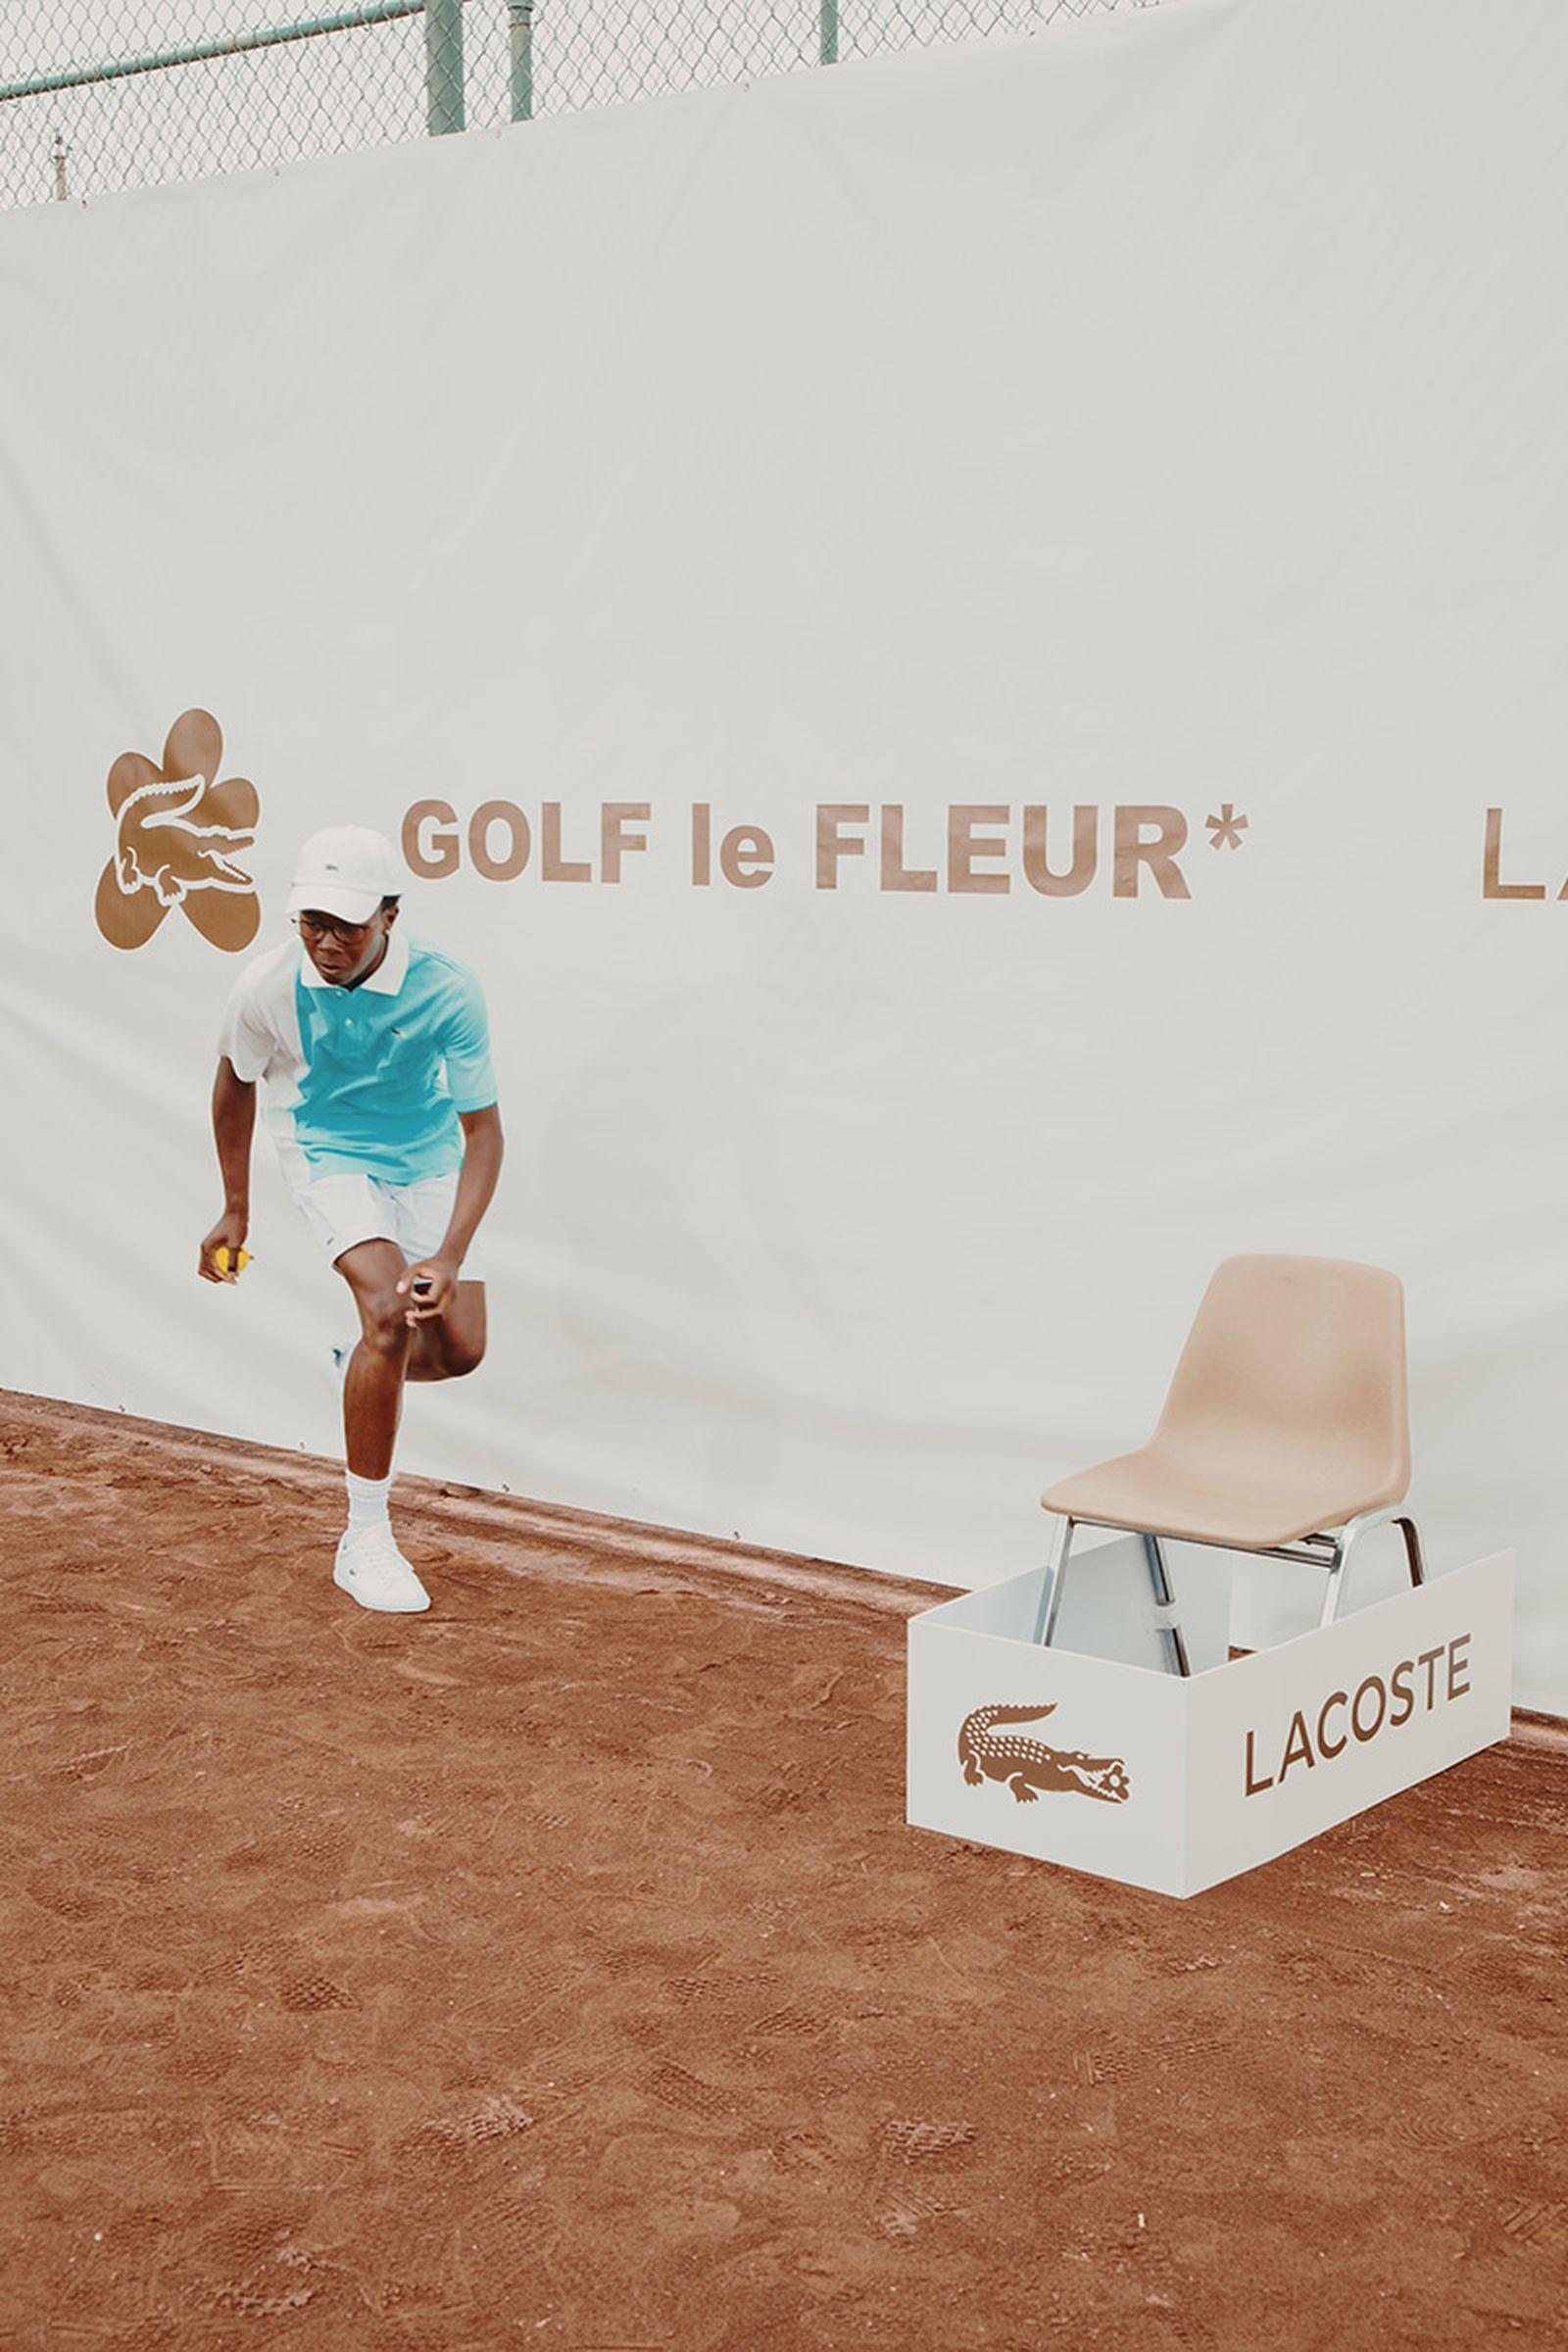 tyler the creator golf wang lacoste collection Golf Le FLEUR*